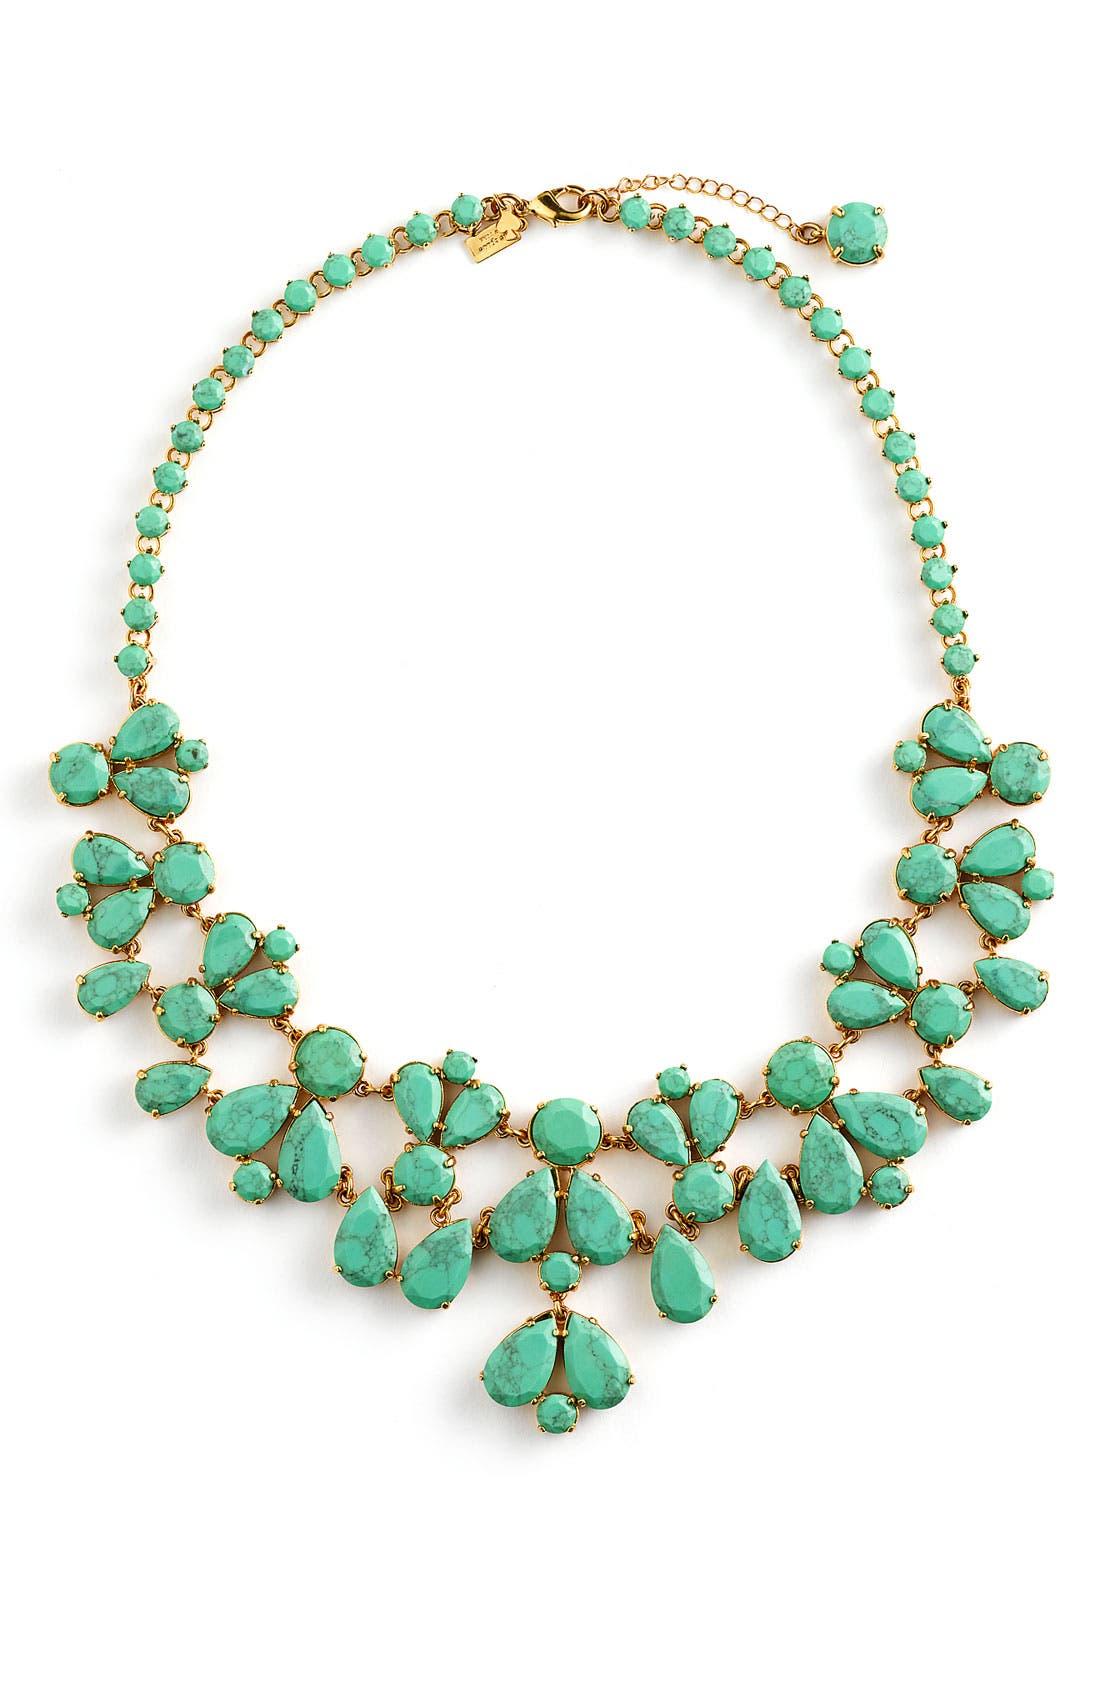 Main Image - kate spade new york 'fiorella' floral bib necklace